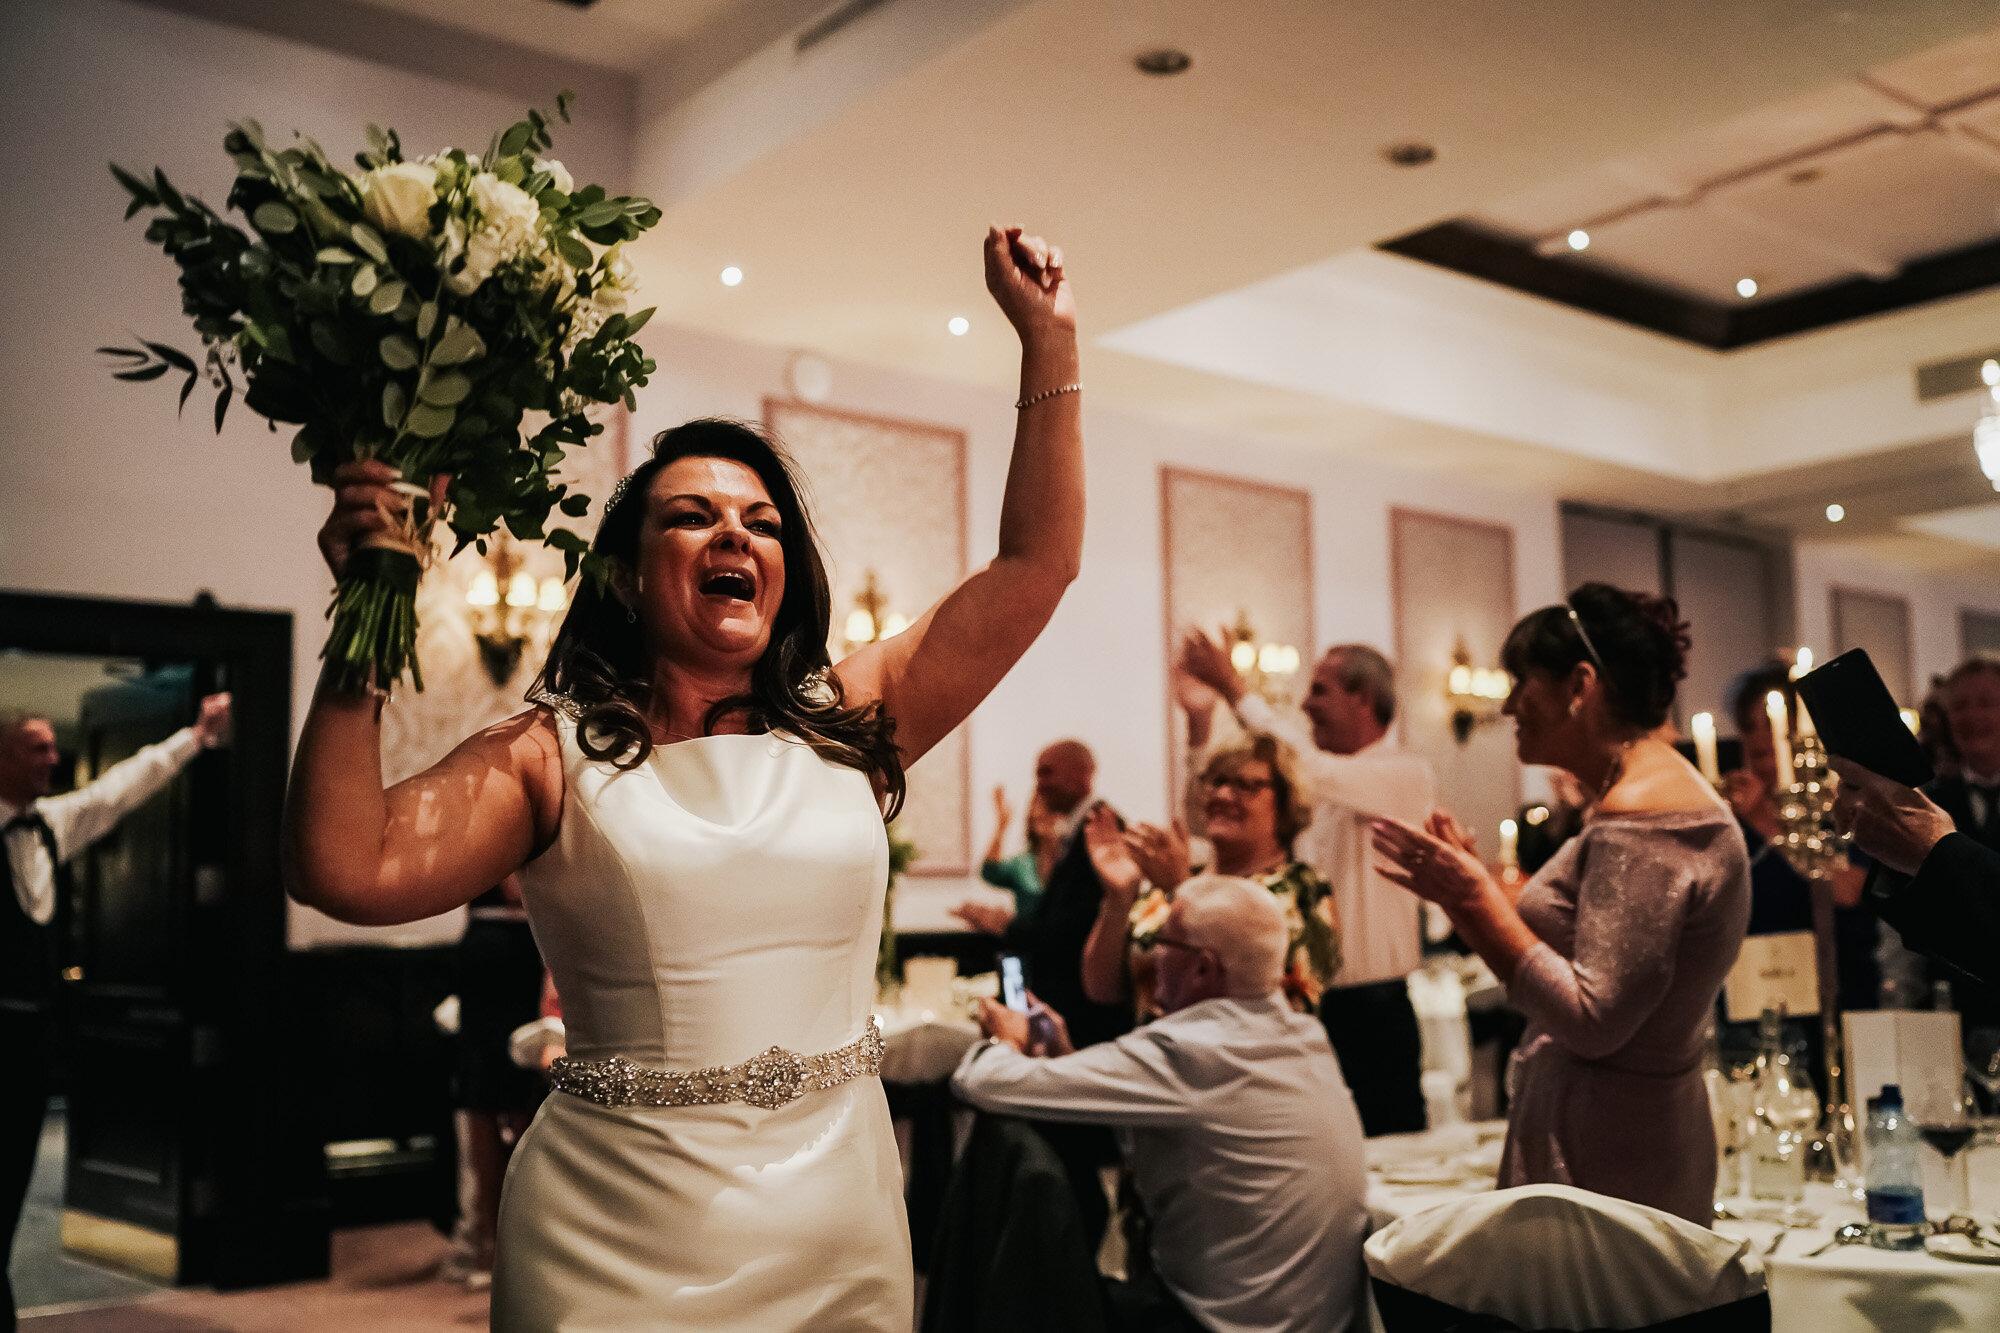 Clontarf Caste wedding photographer Wedding Photography dublin ireland wedding photographer (43 of 58).jpg